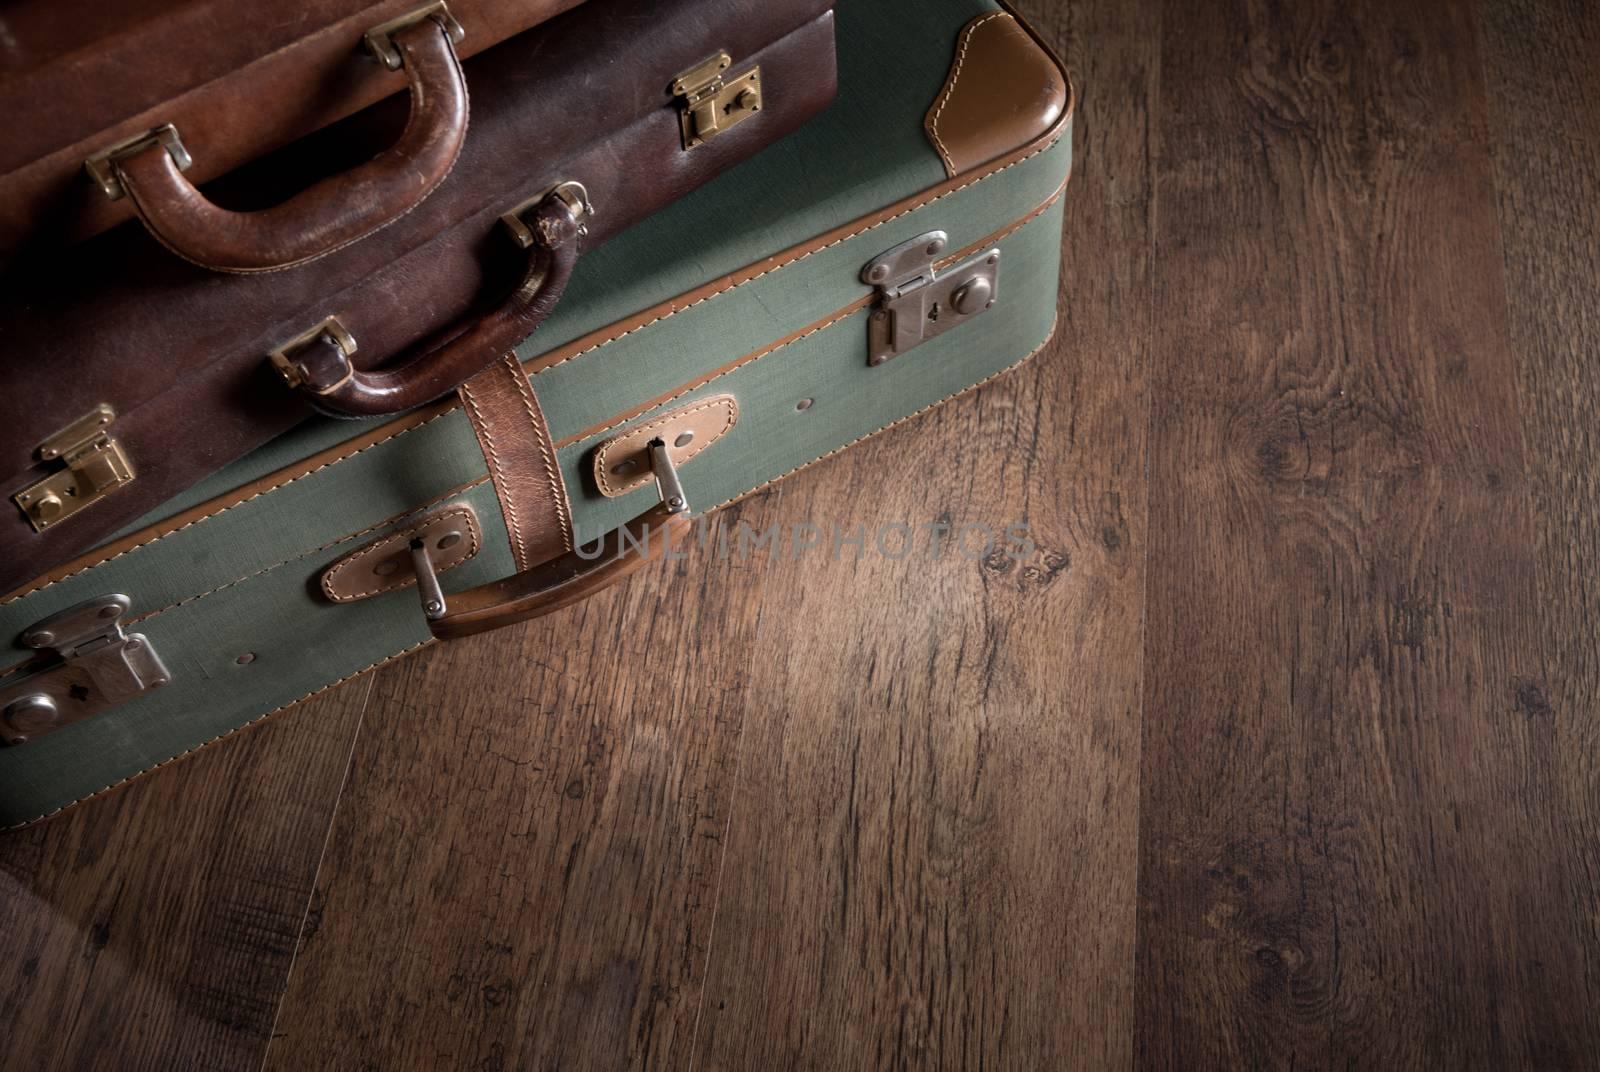 Vintage luggage close-up on dark hardwood floor, travelling concept.